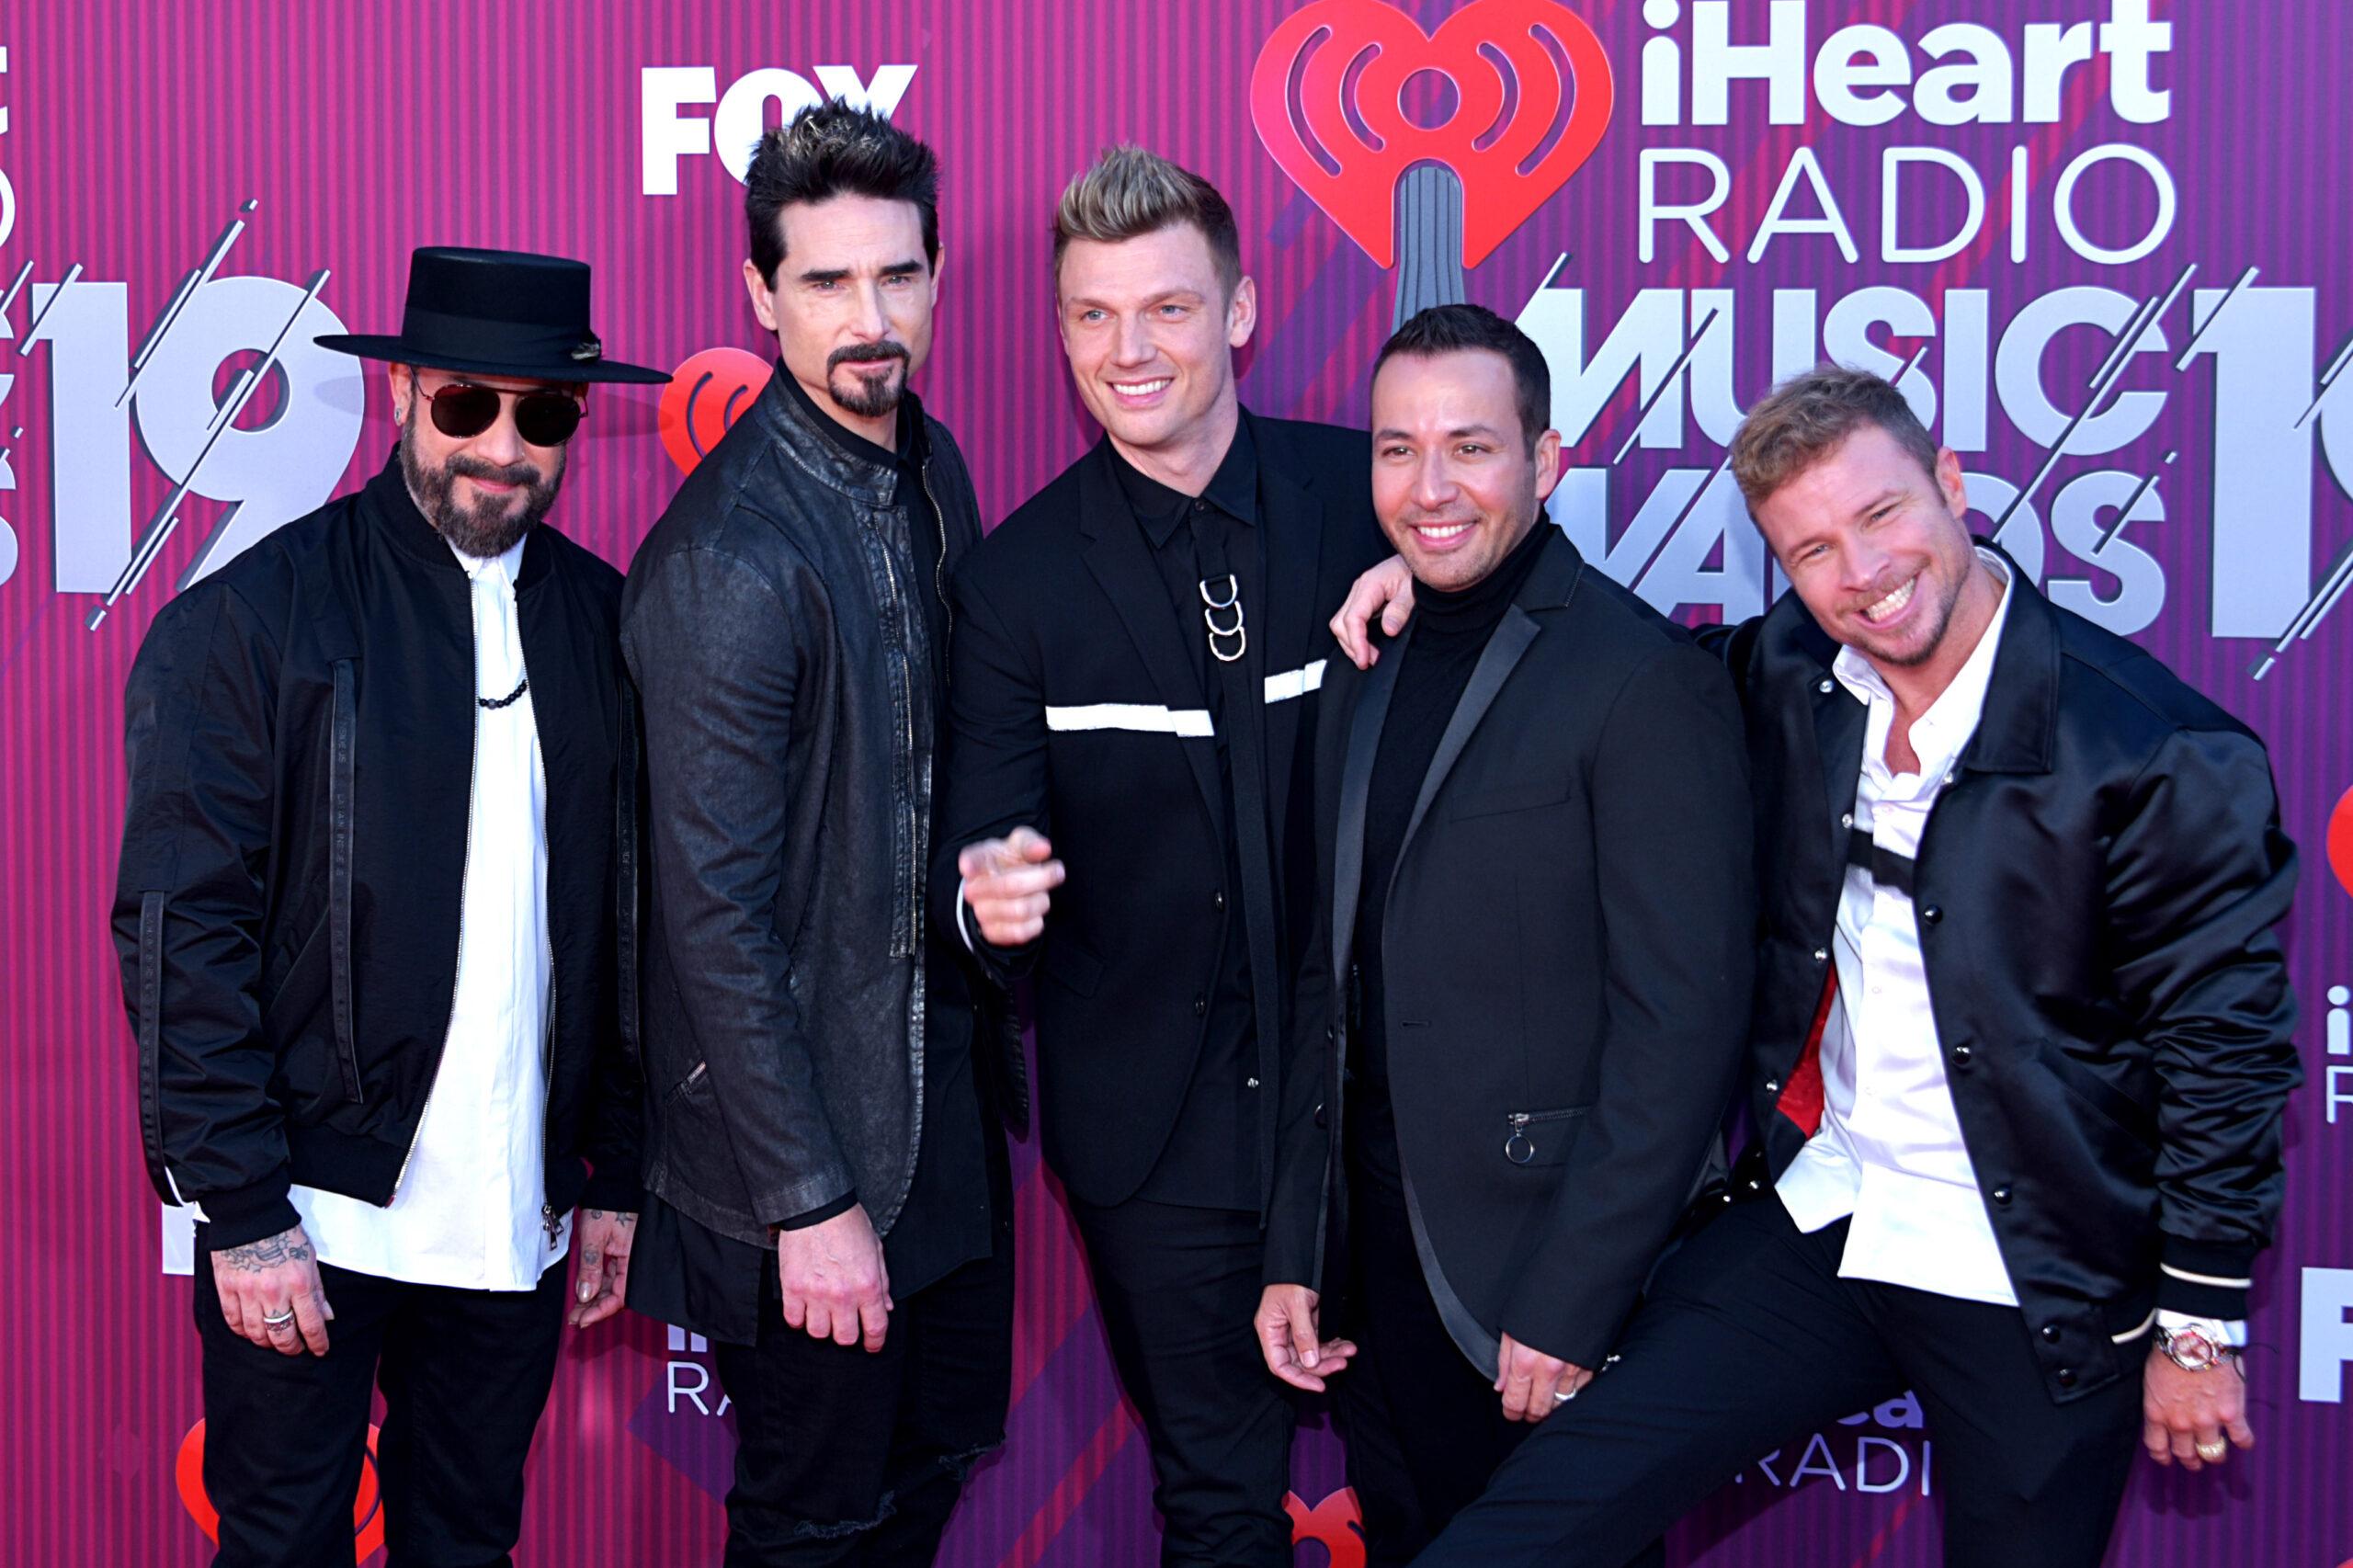 Backstreet Boys Biography